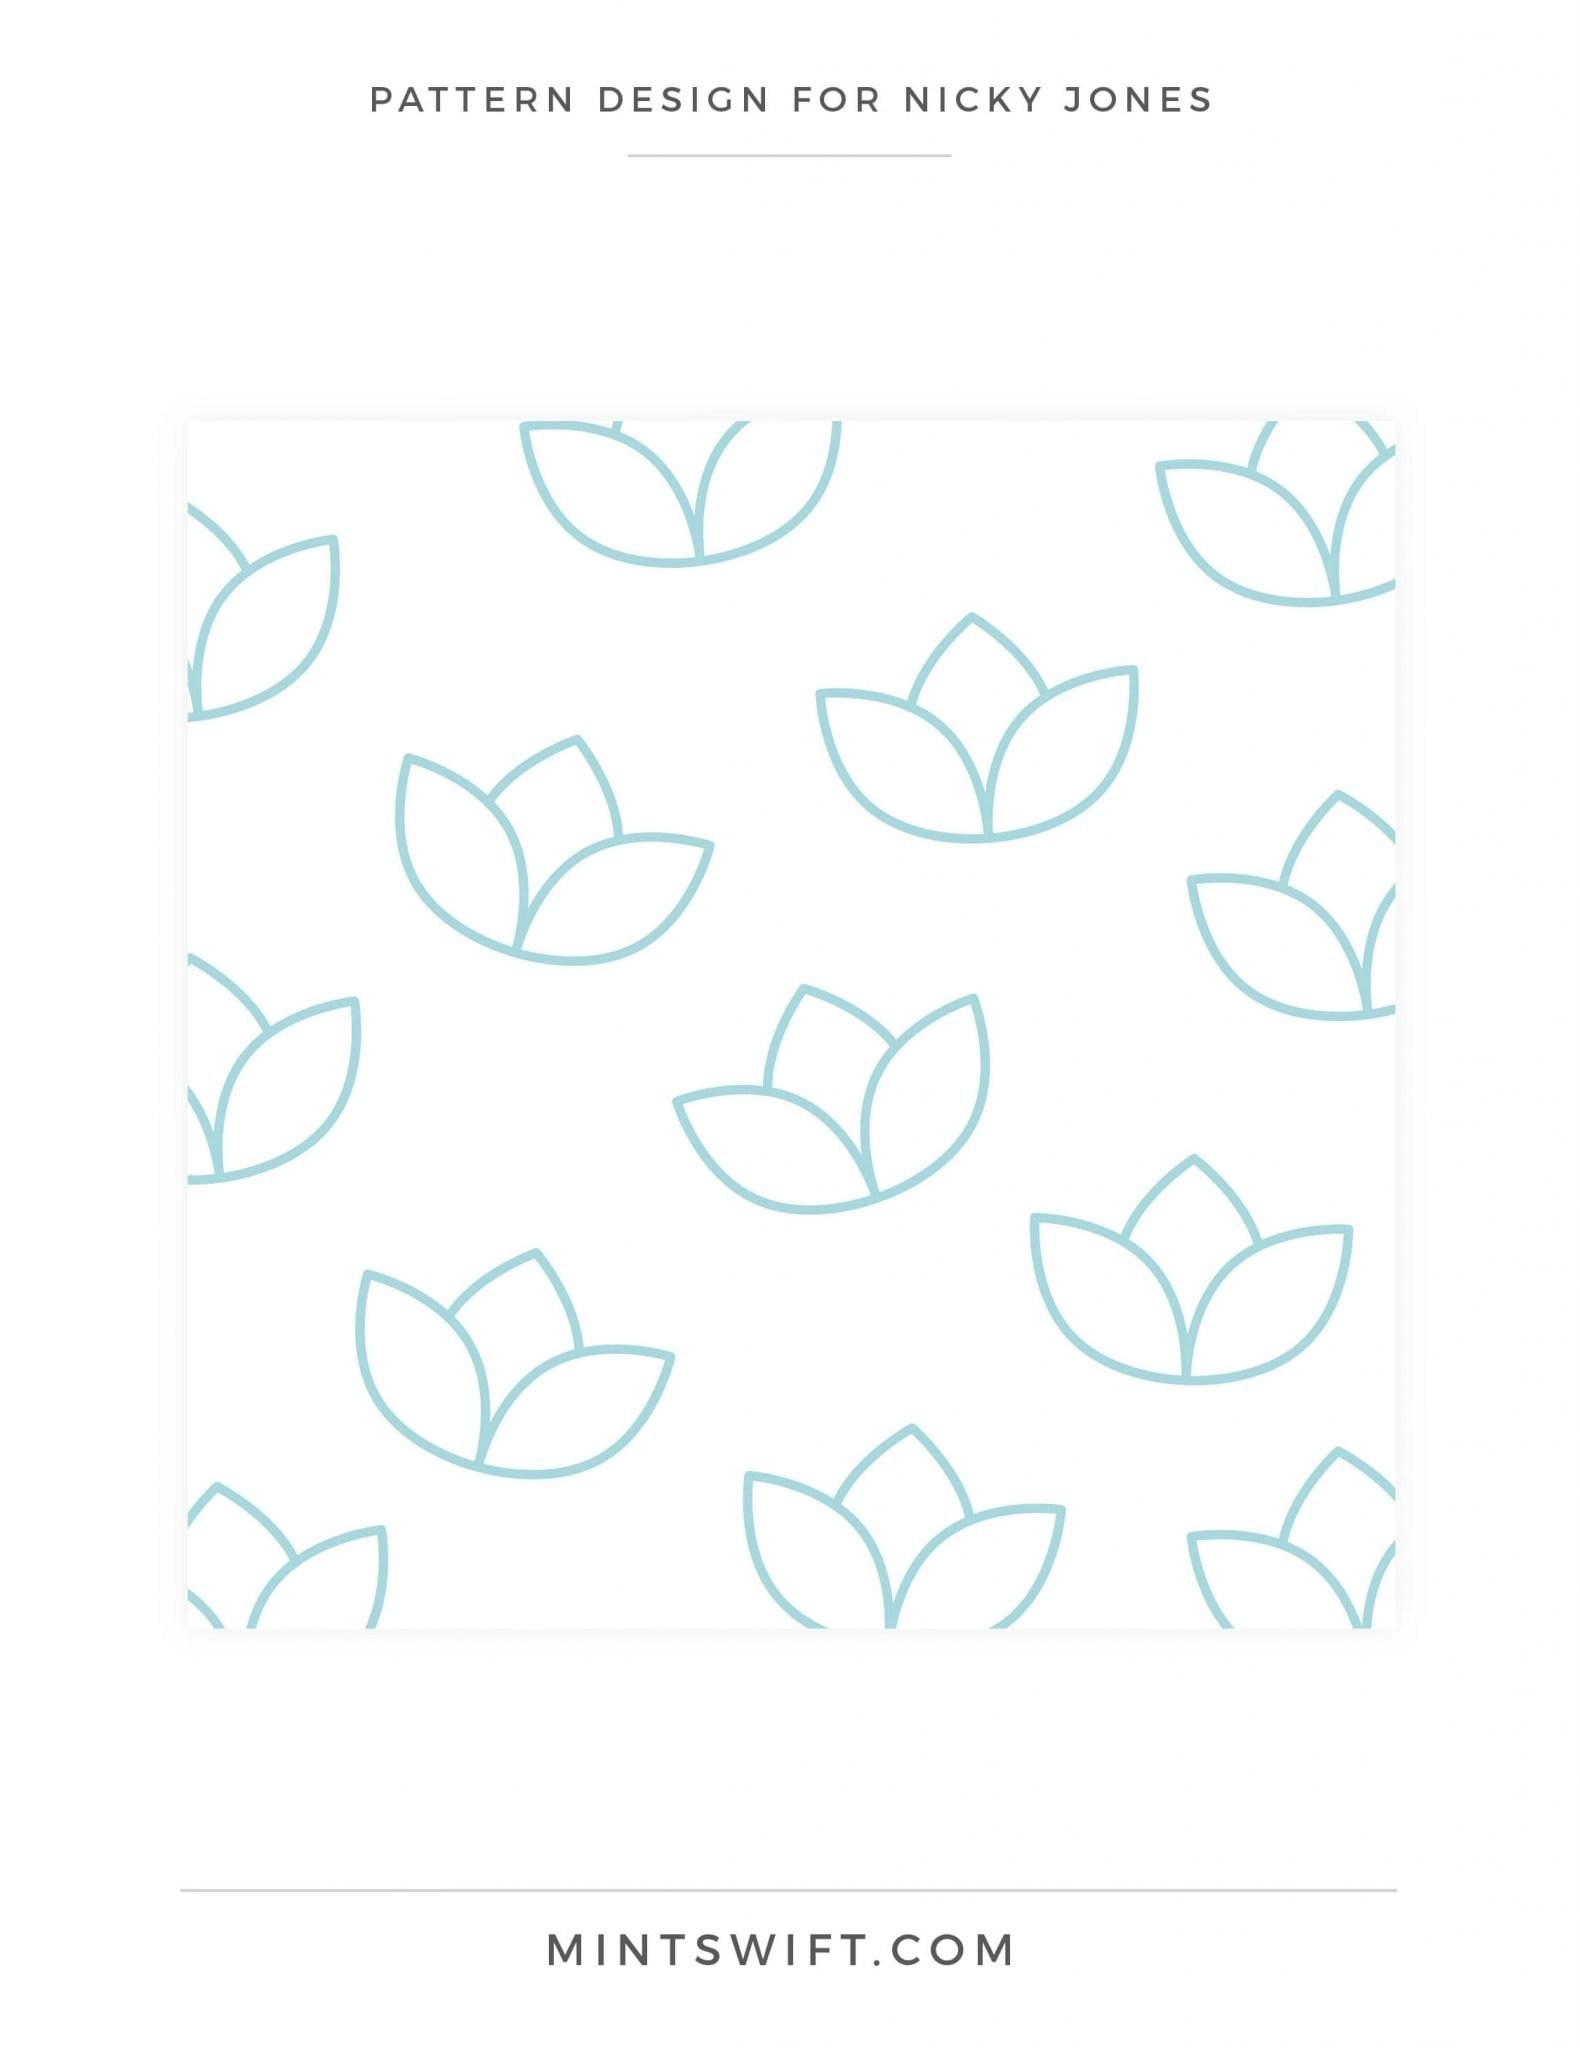 Nicky Jones - Pattern Design - Brand Design Package - MintSwift